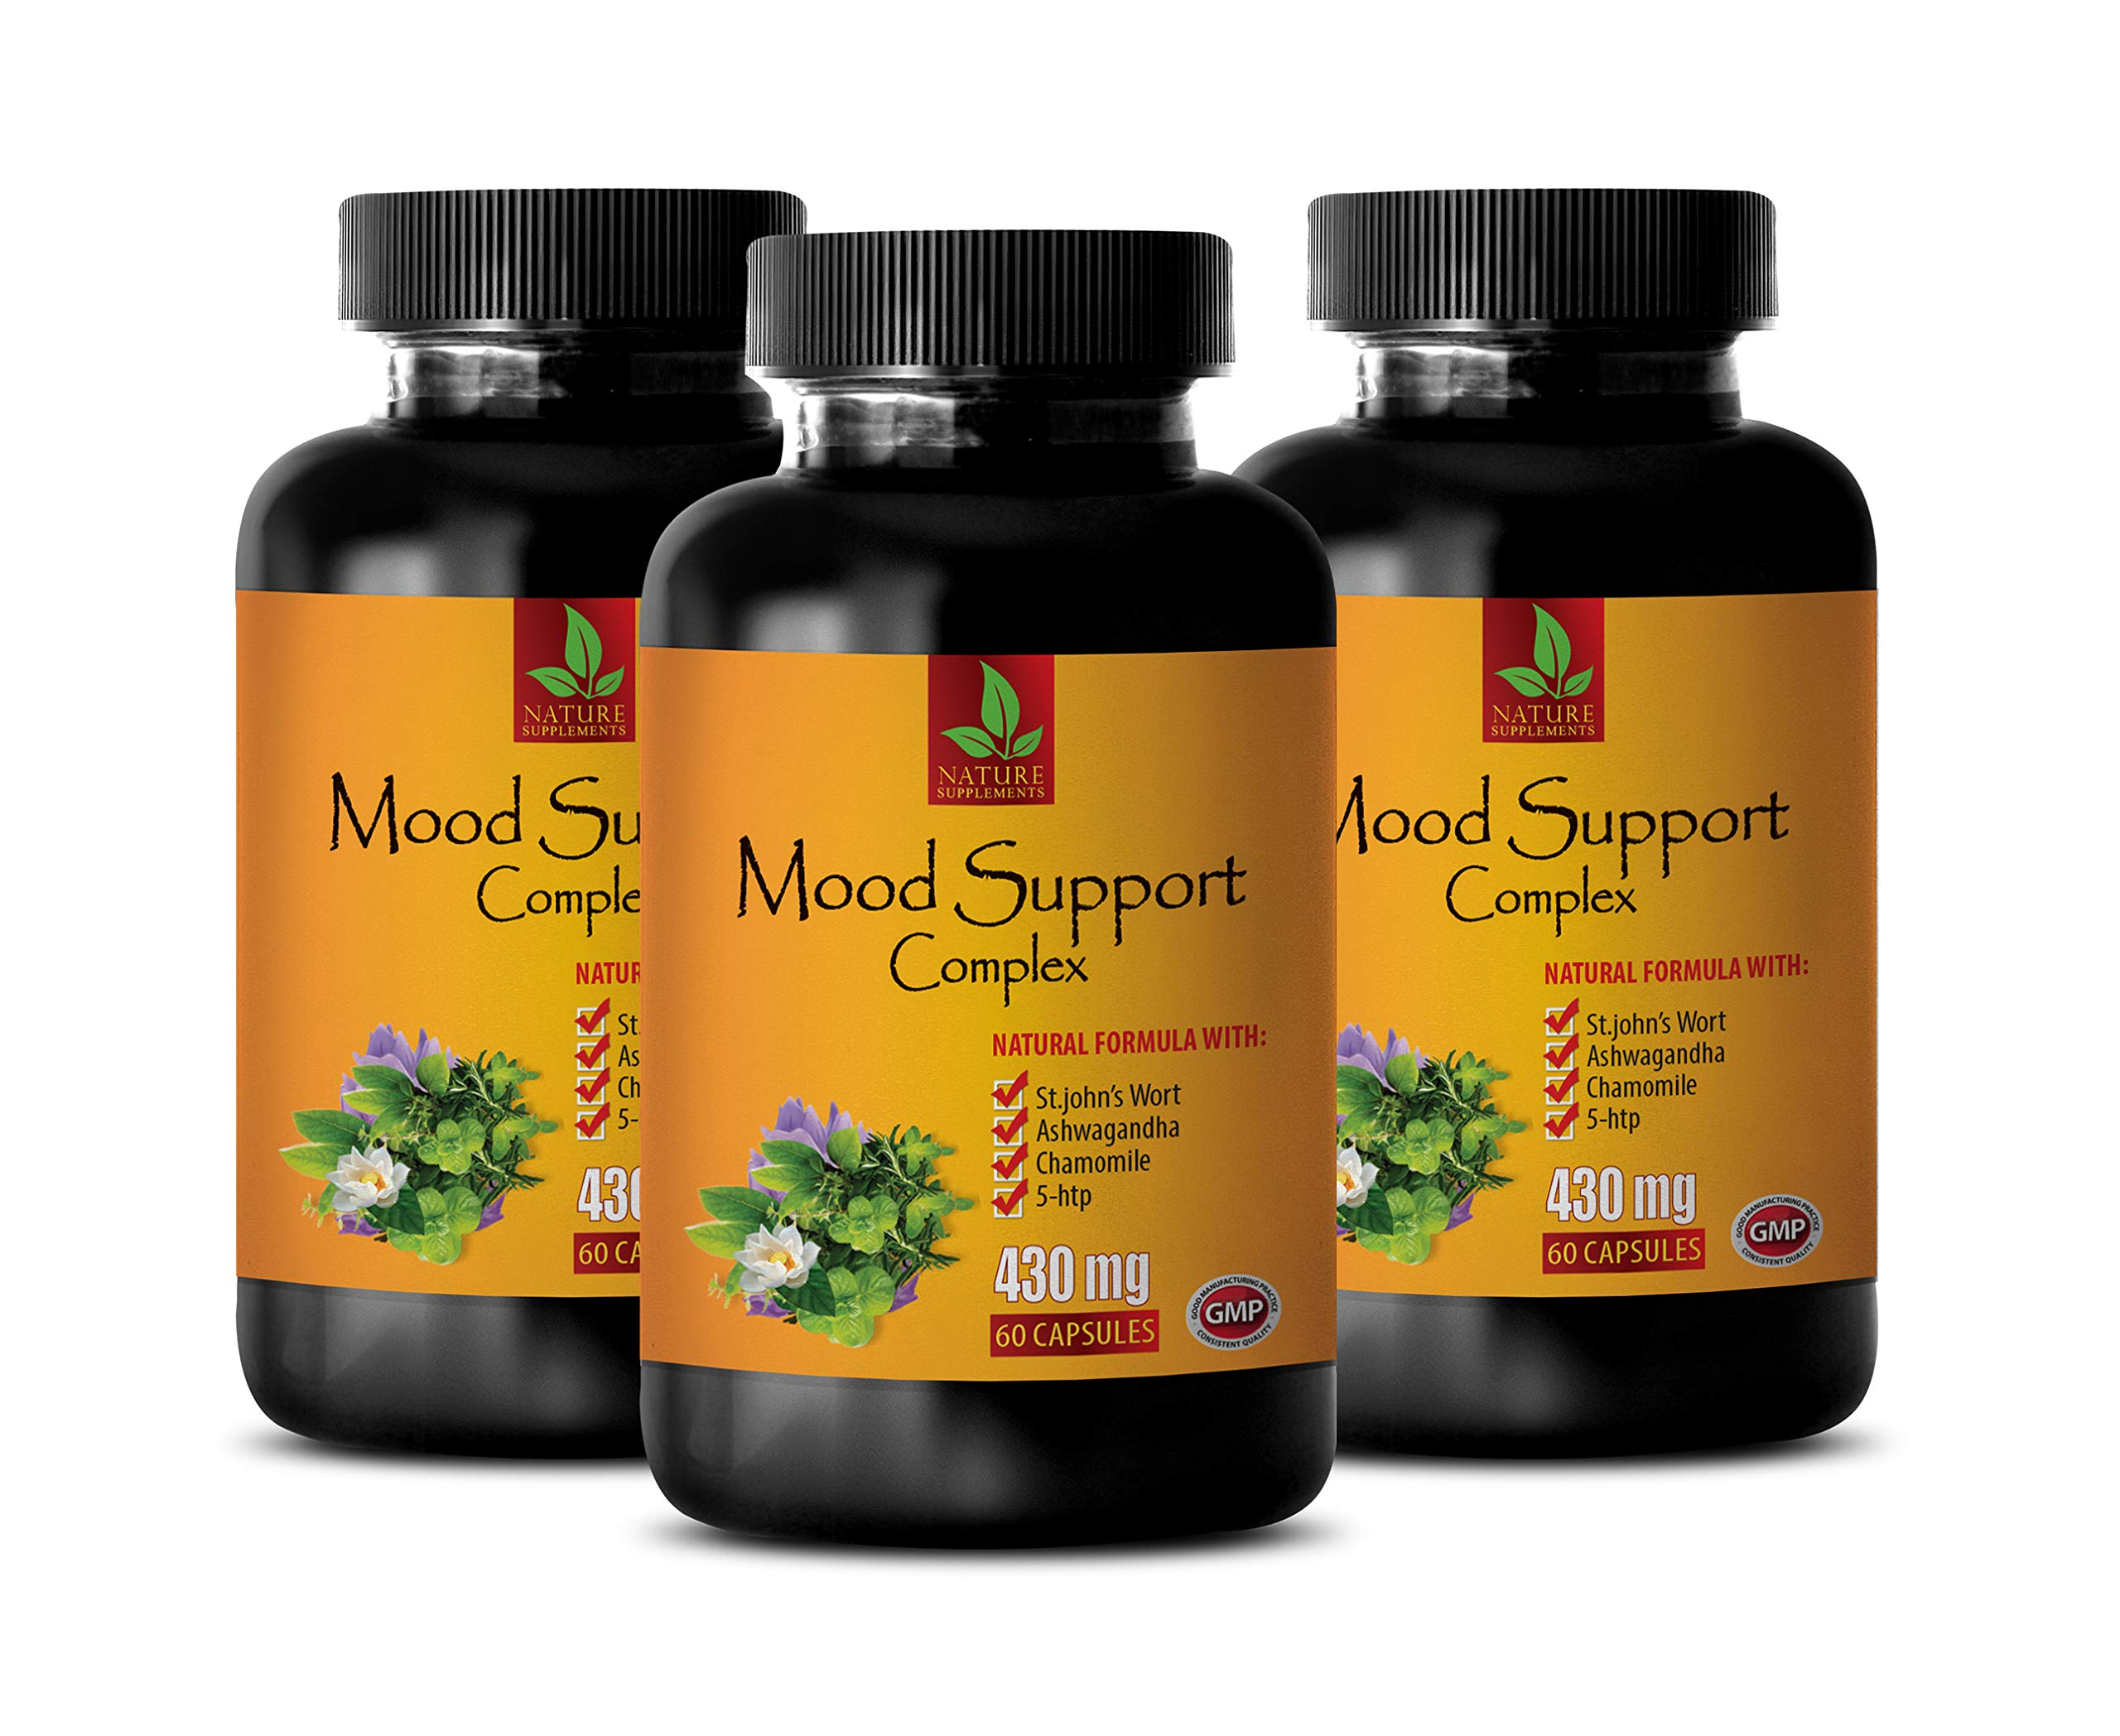 Mood Vitamins for Men - Mood Support Complex - Natural Formula - b12 methylcobalamin Complex - 3 Bottles 180 Vegetable Capsules by NATURE SUPPLEMENTS